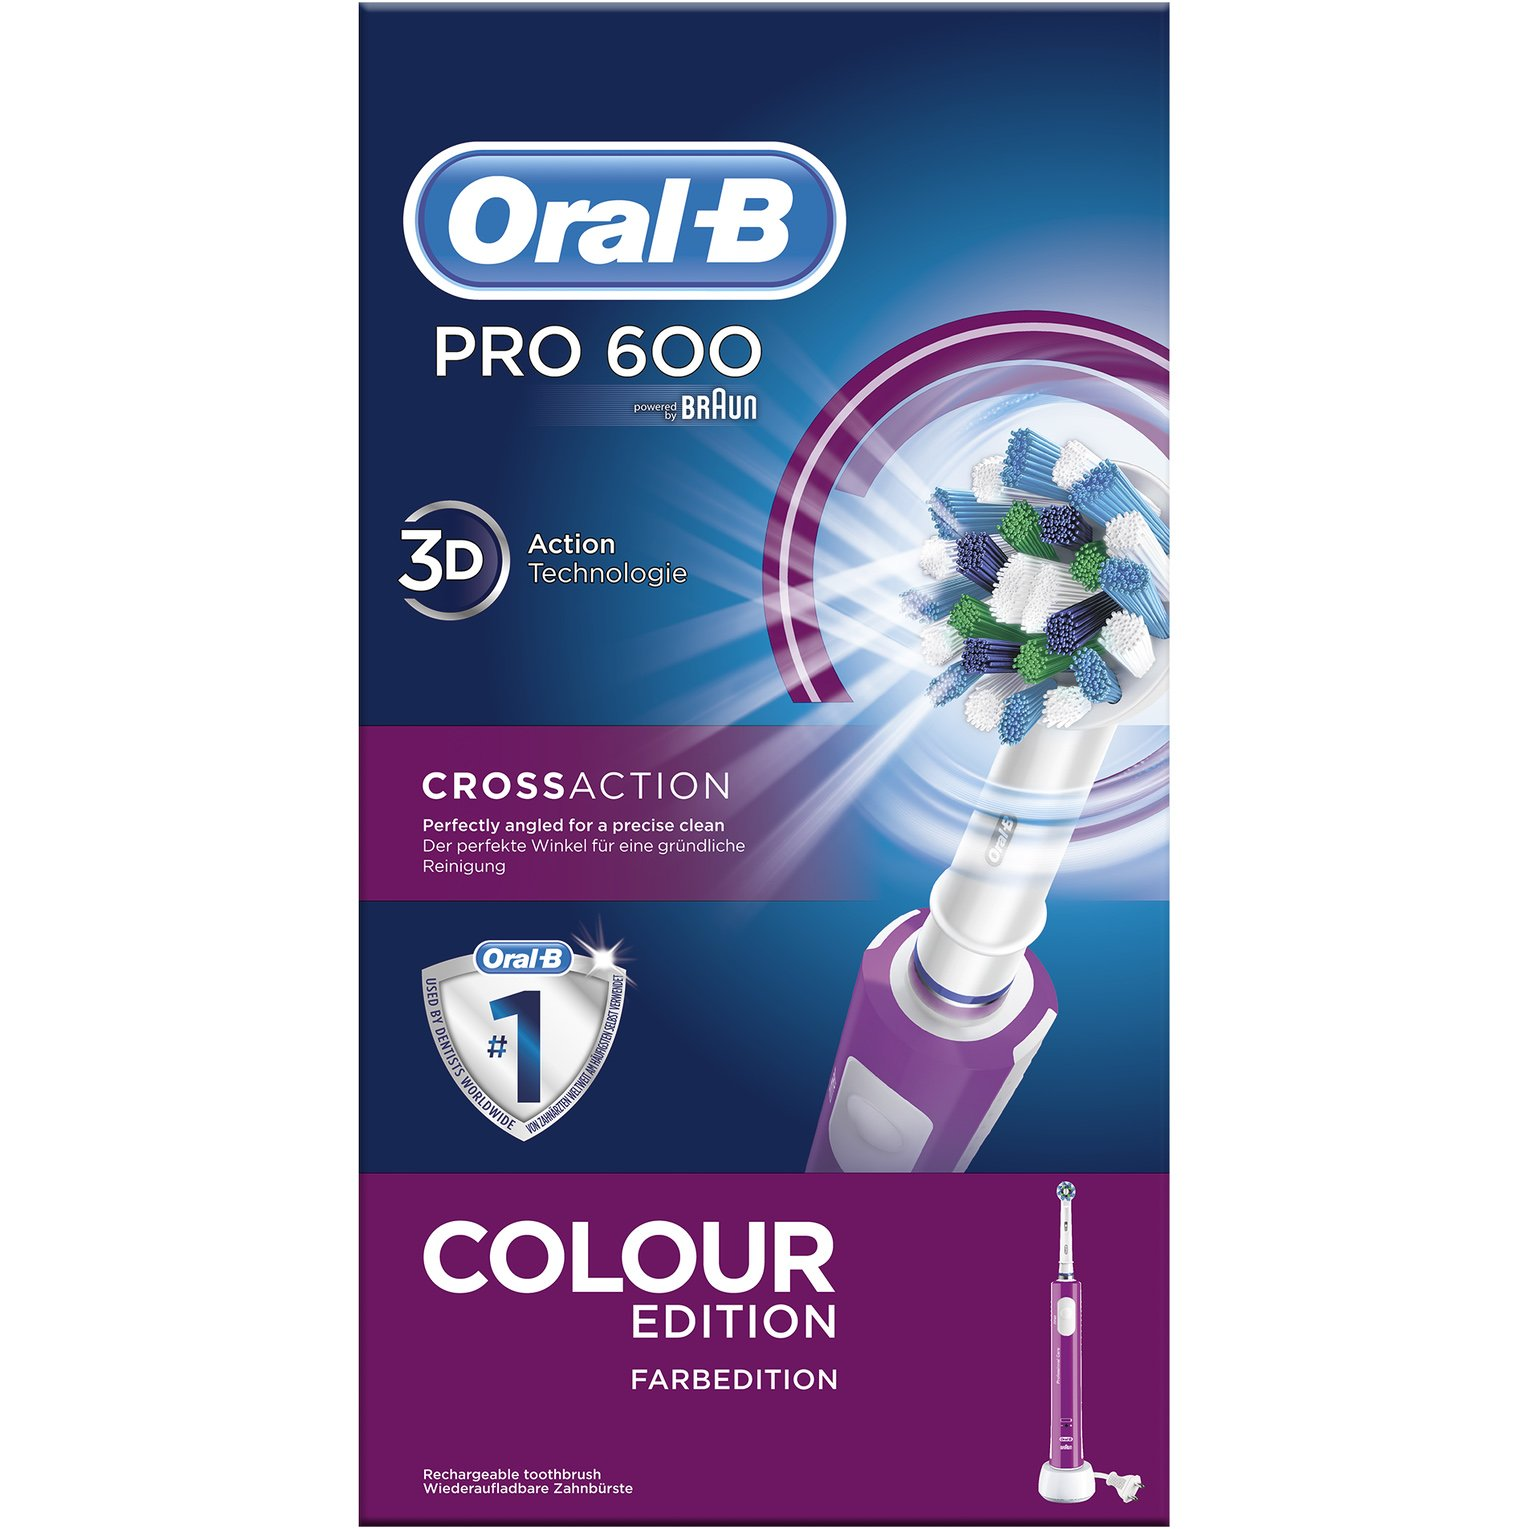 Oral-B PRO CrossAction 600 Μωβ Επαναφορτιζόμενη Ηλεκτρική Οδοντόβουρτσα